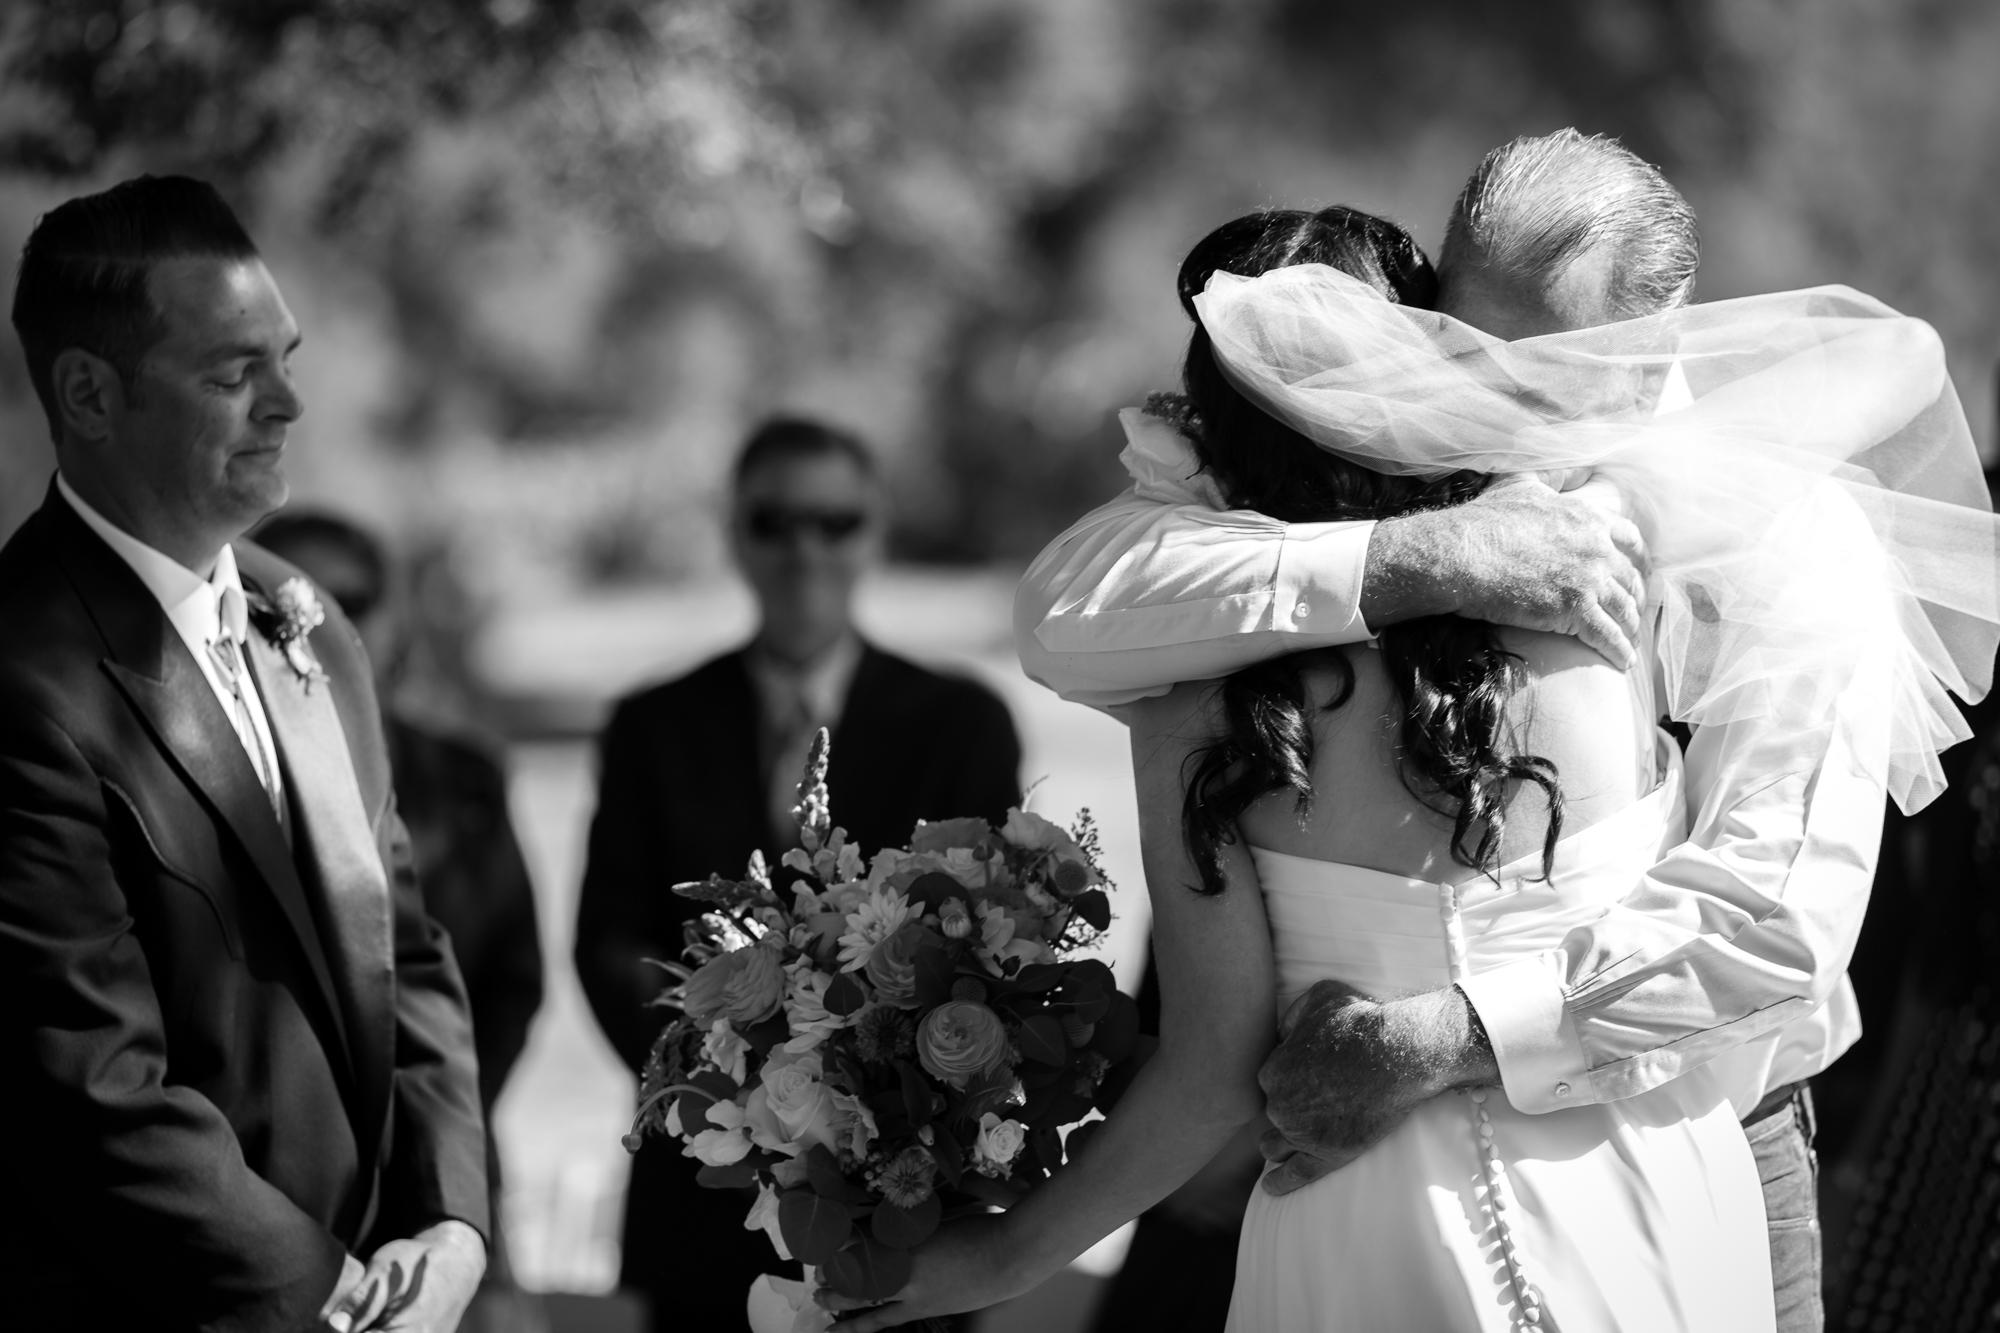 Gary-Kasl-SandKasl-Imaging-Wedding-Photography-25.jpg